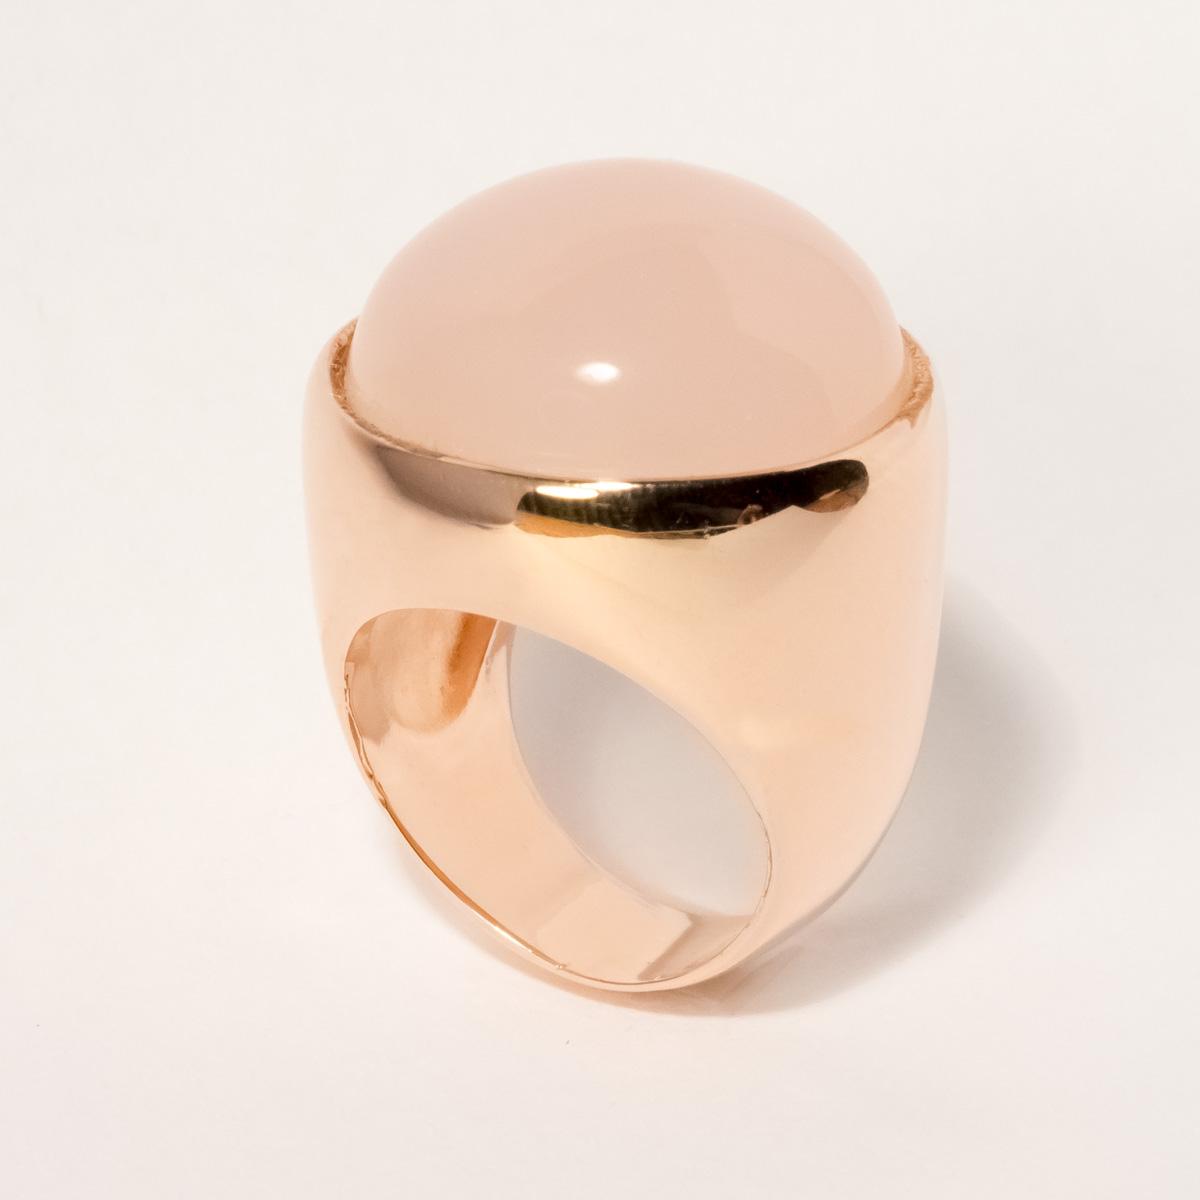 Connu quarzo rosa | cinziaemme JH12